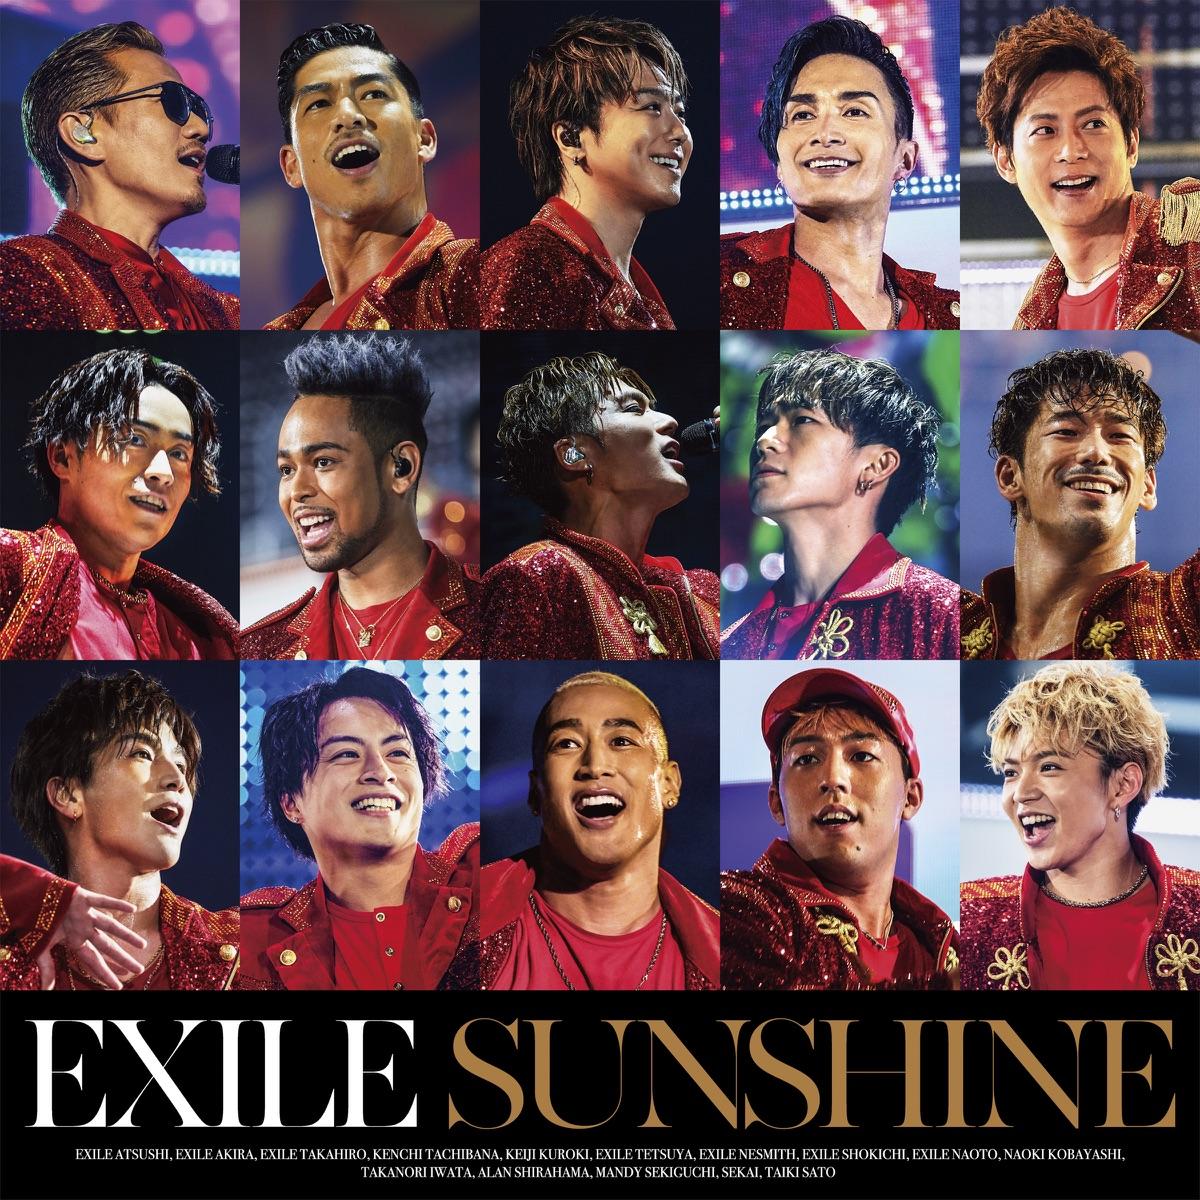 『EXILE - SUNSHINE』収録の『SUNSHINE』ジャケット